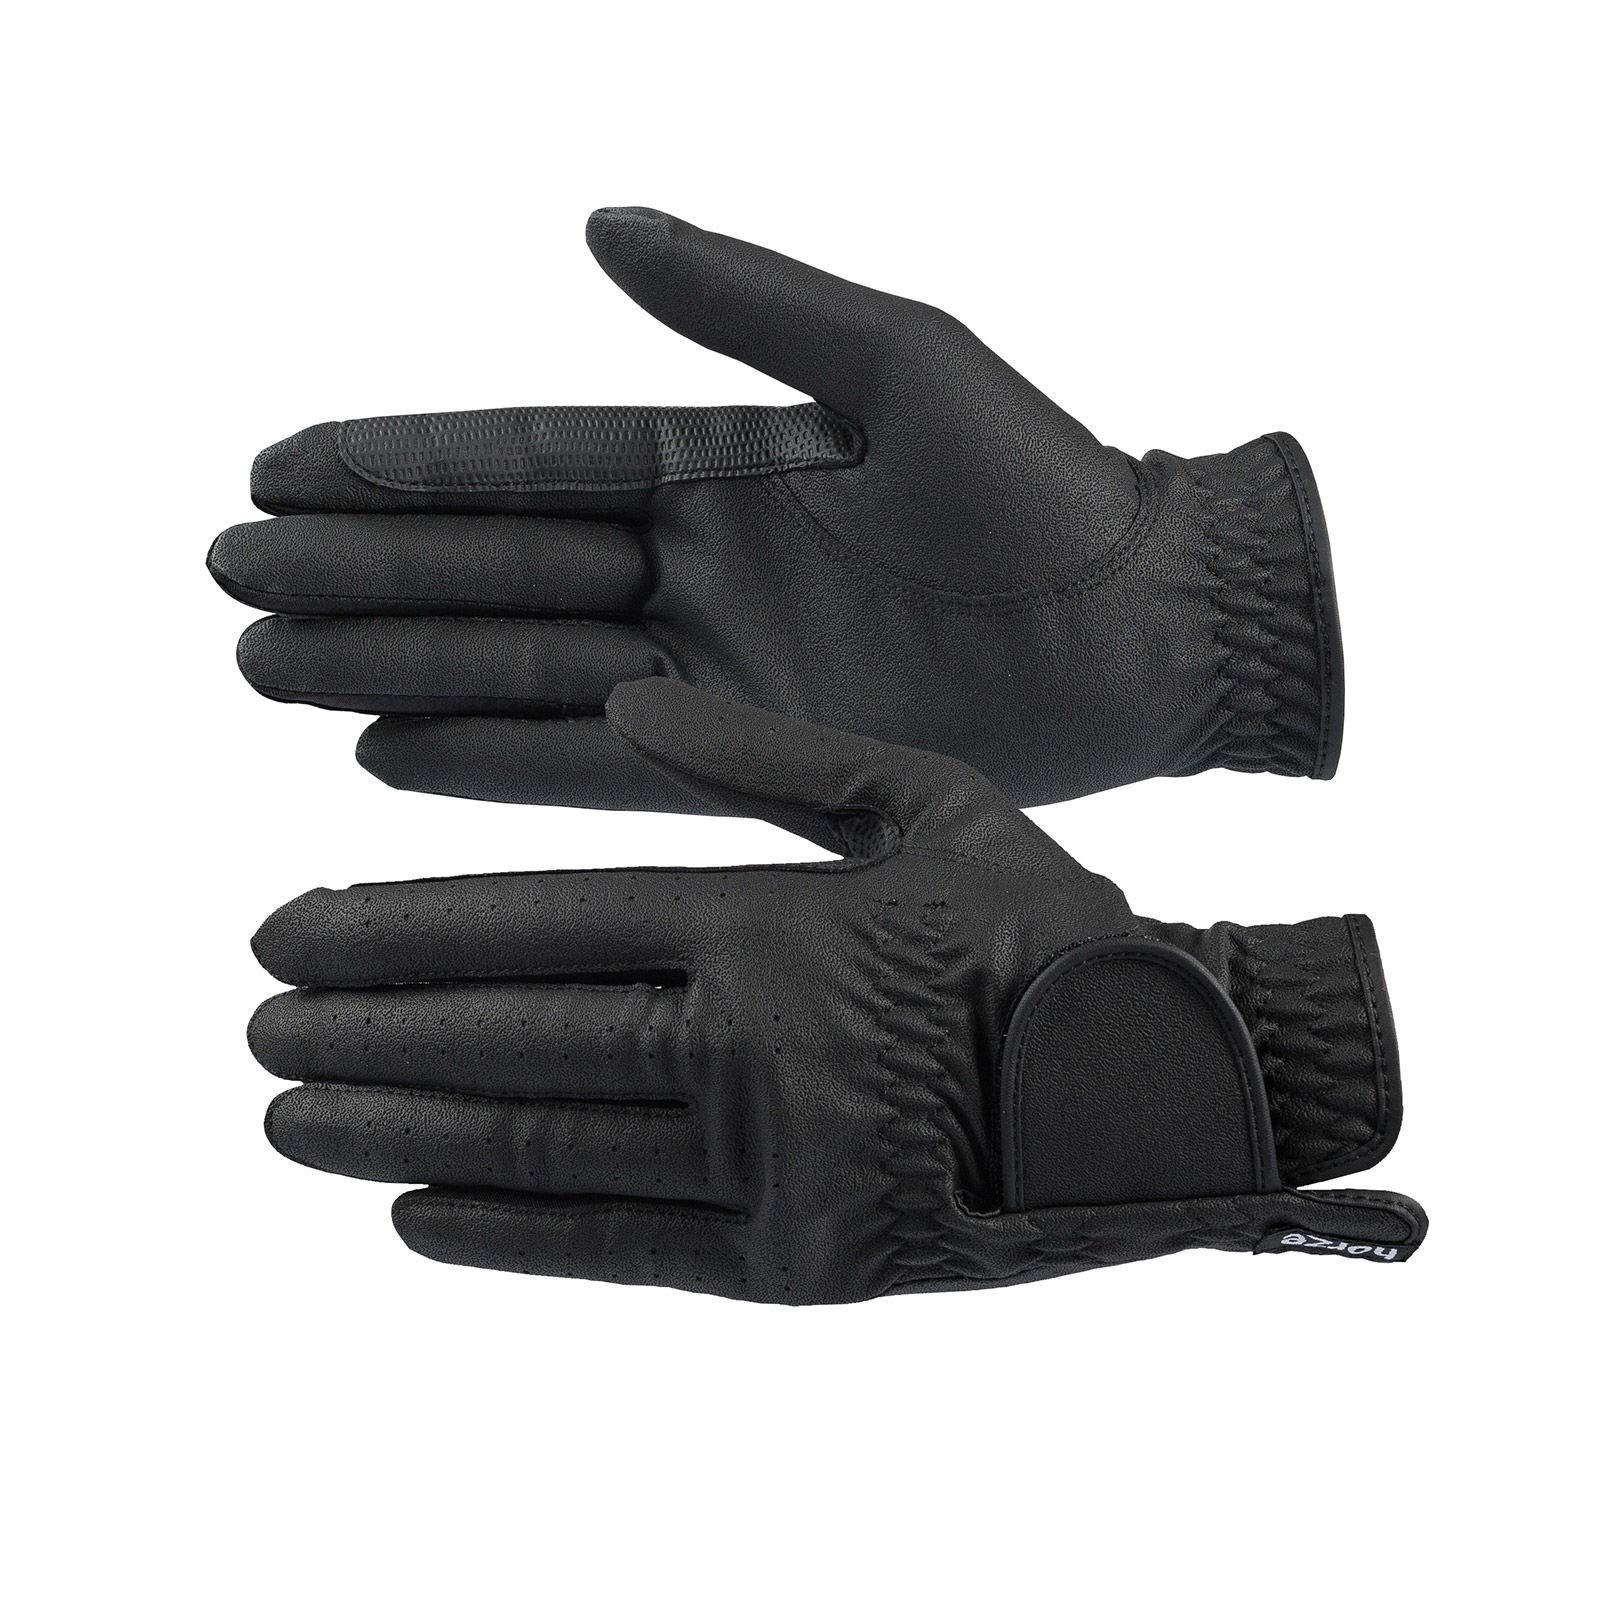 HORZE Eleanor PU-Leather Gloves - Black - 9